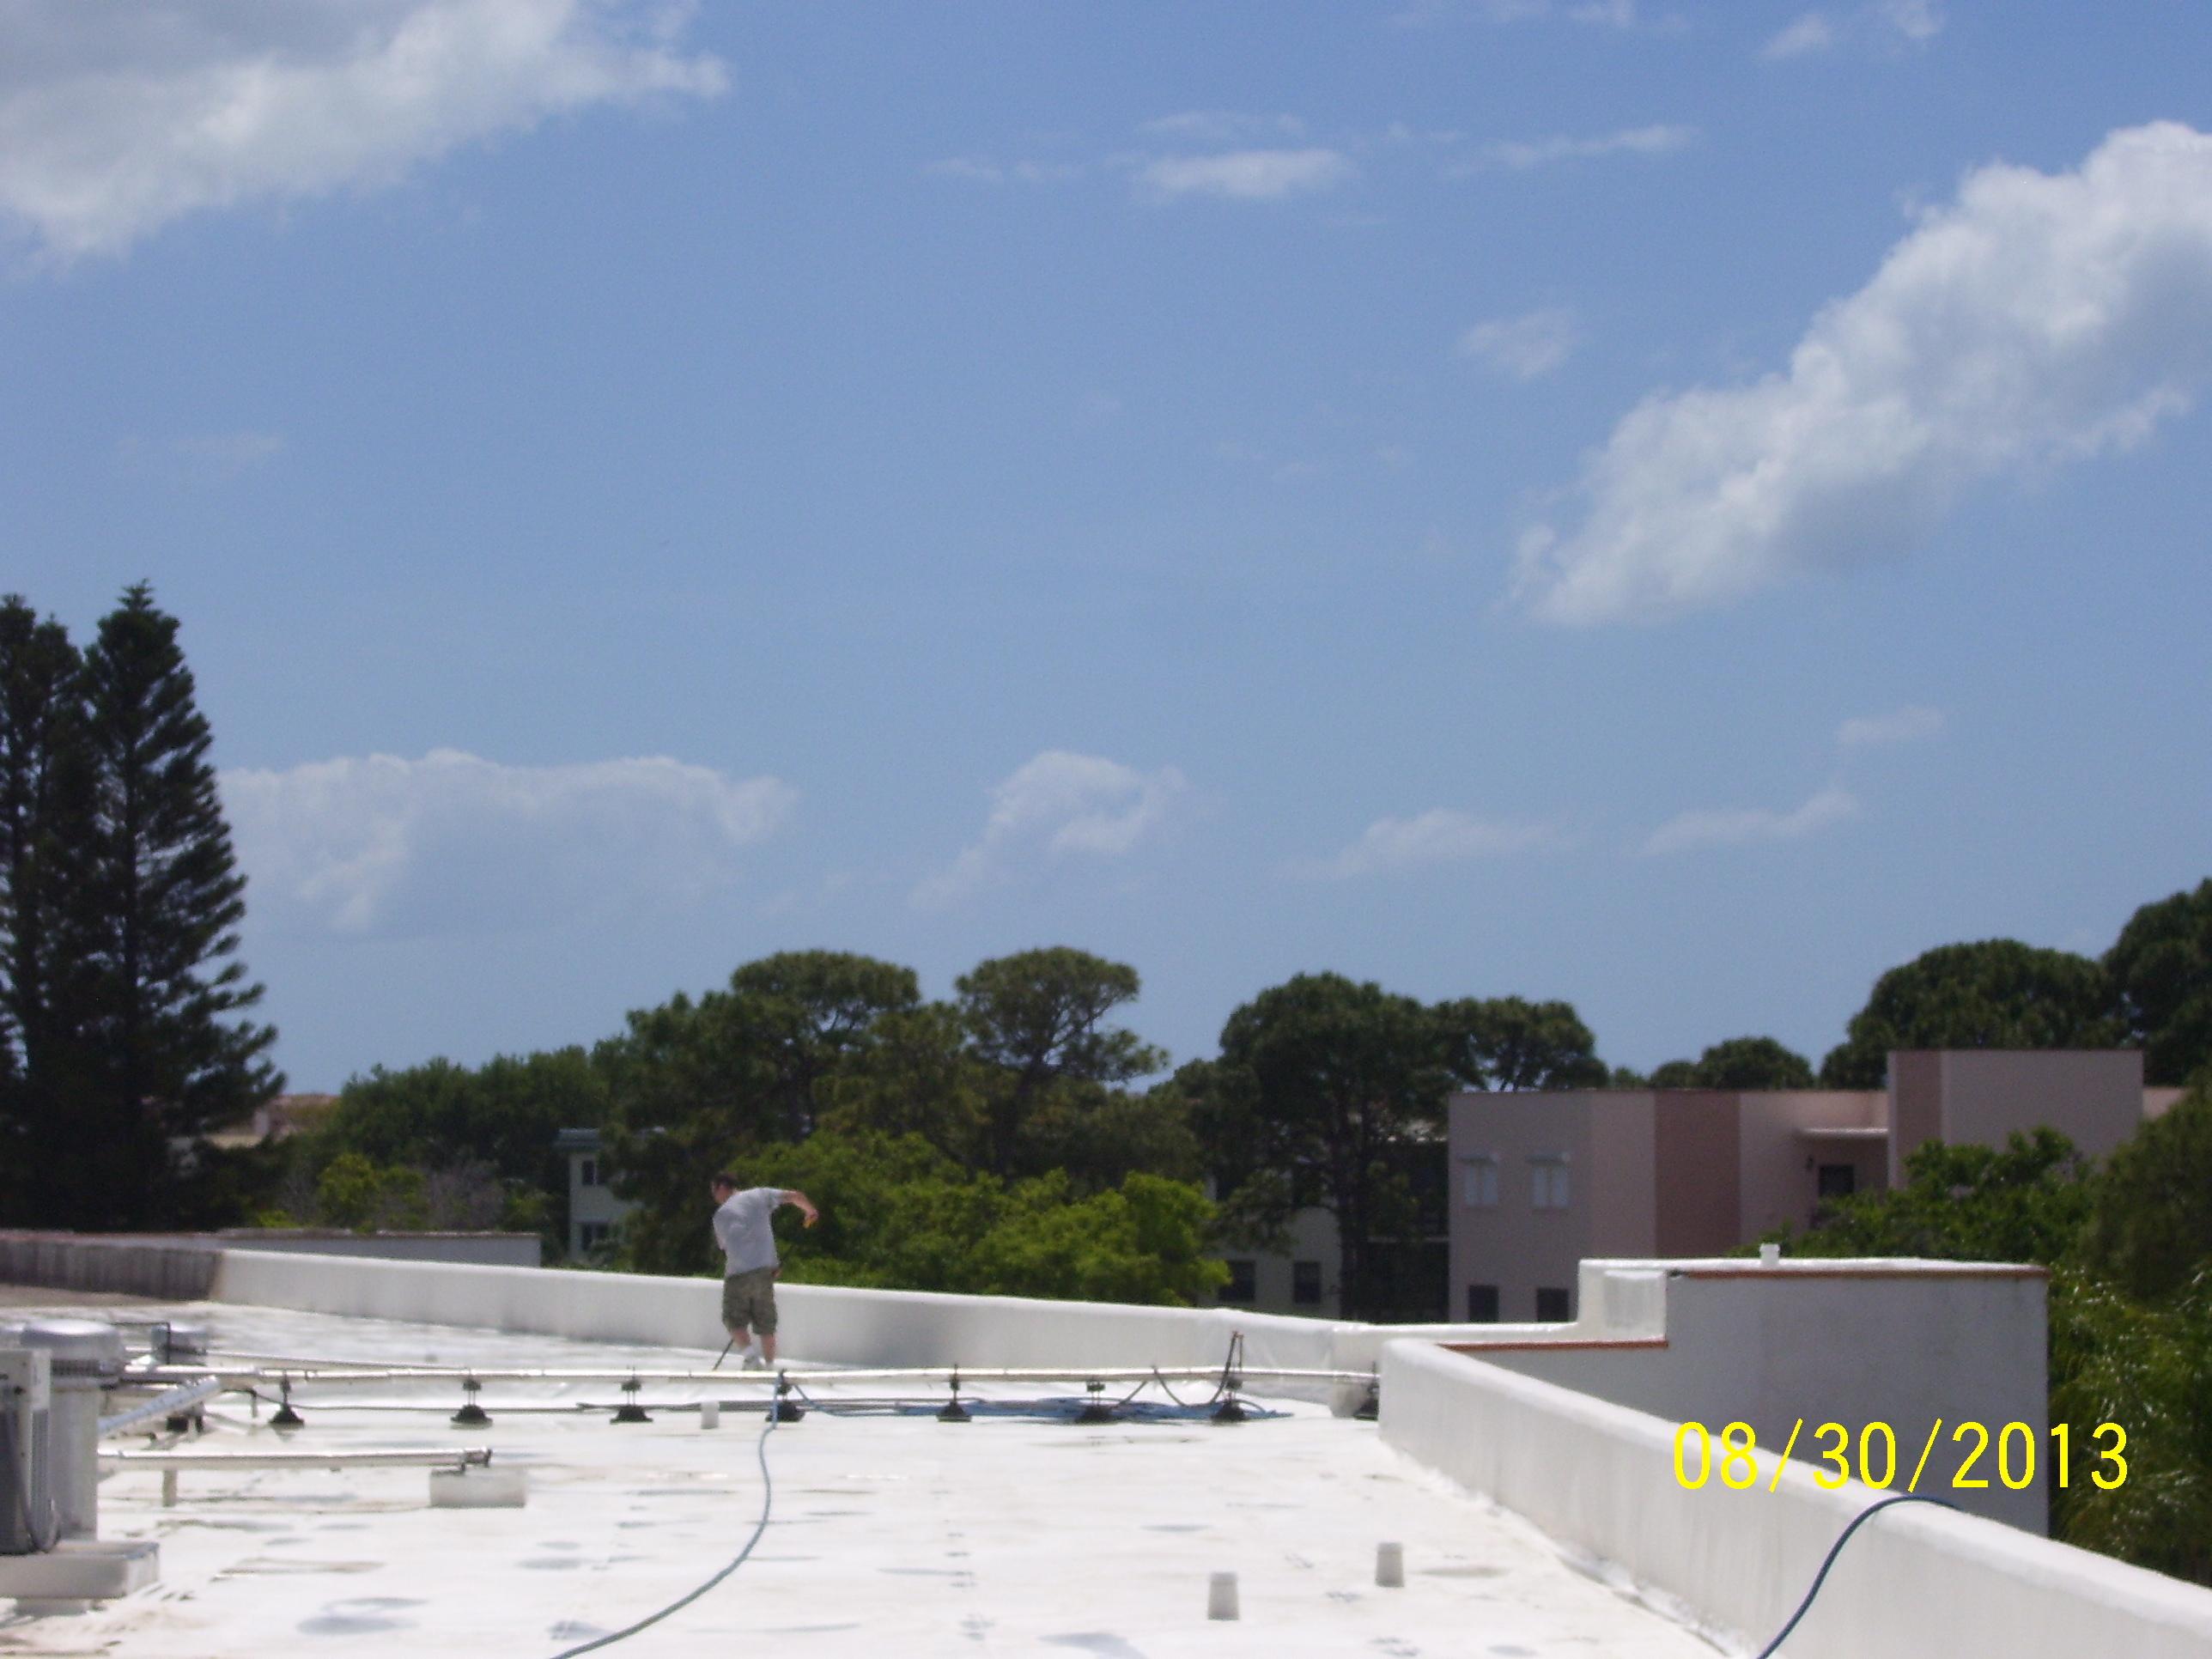 Personals in port richey fl ericfl single male New Port Richey Florida , New Port Richey dating service